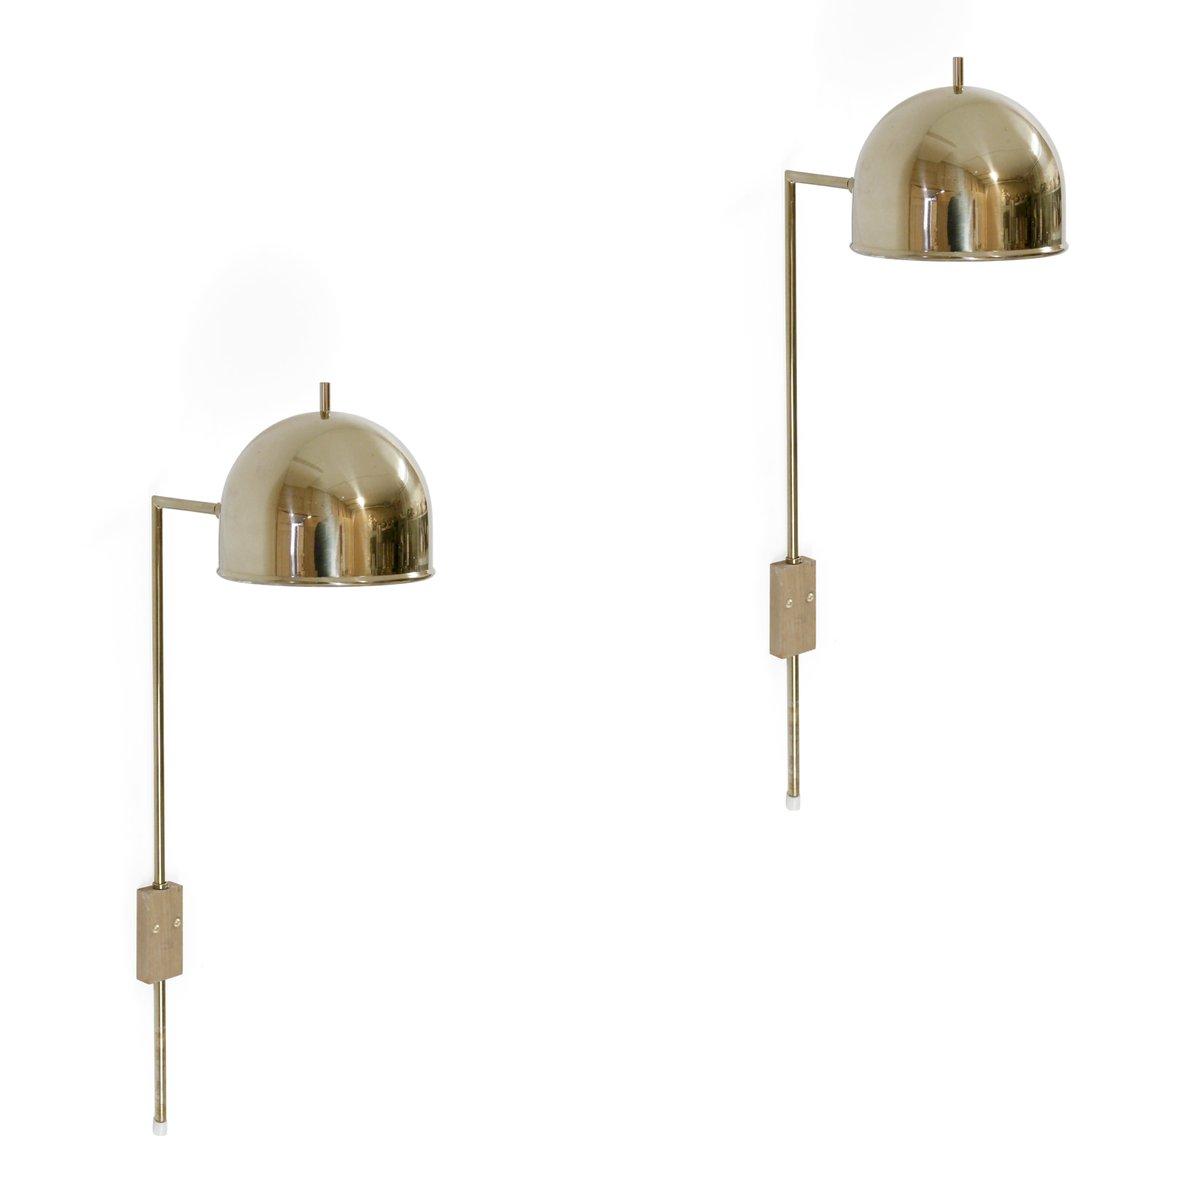 Mid Century Wall Lights Uk: Mid-Century Swedish Brass Wall Light From Bergboms, 1960s